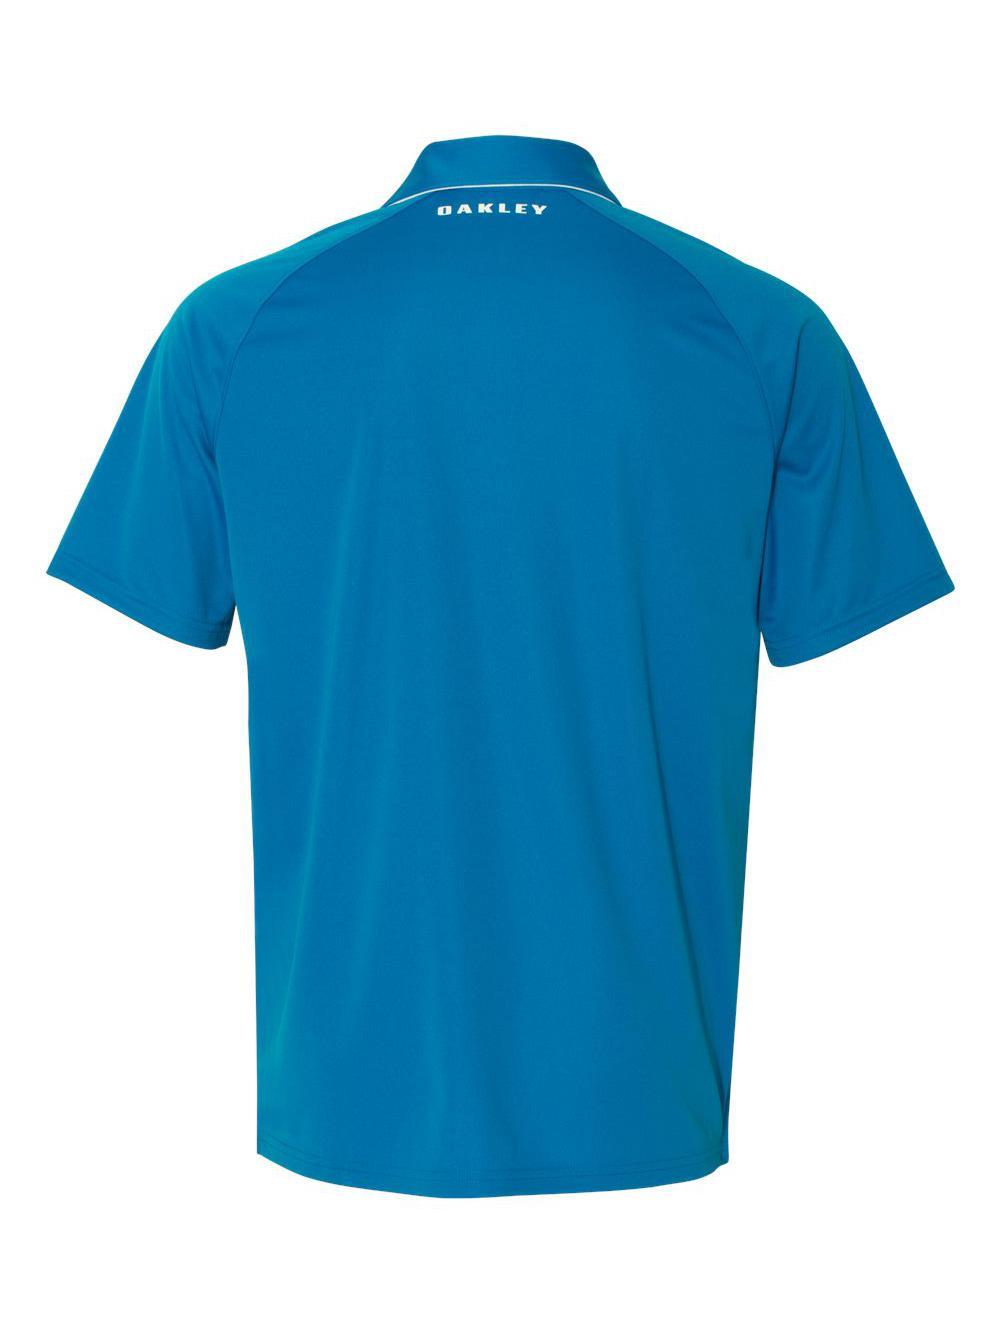 Oakley-Elemental-2-0-Sport-Shirt-432632ODM thumbnail 4